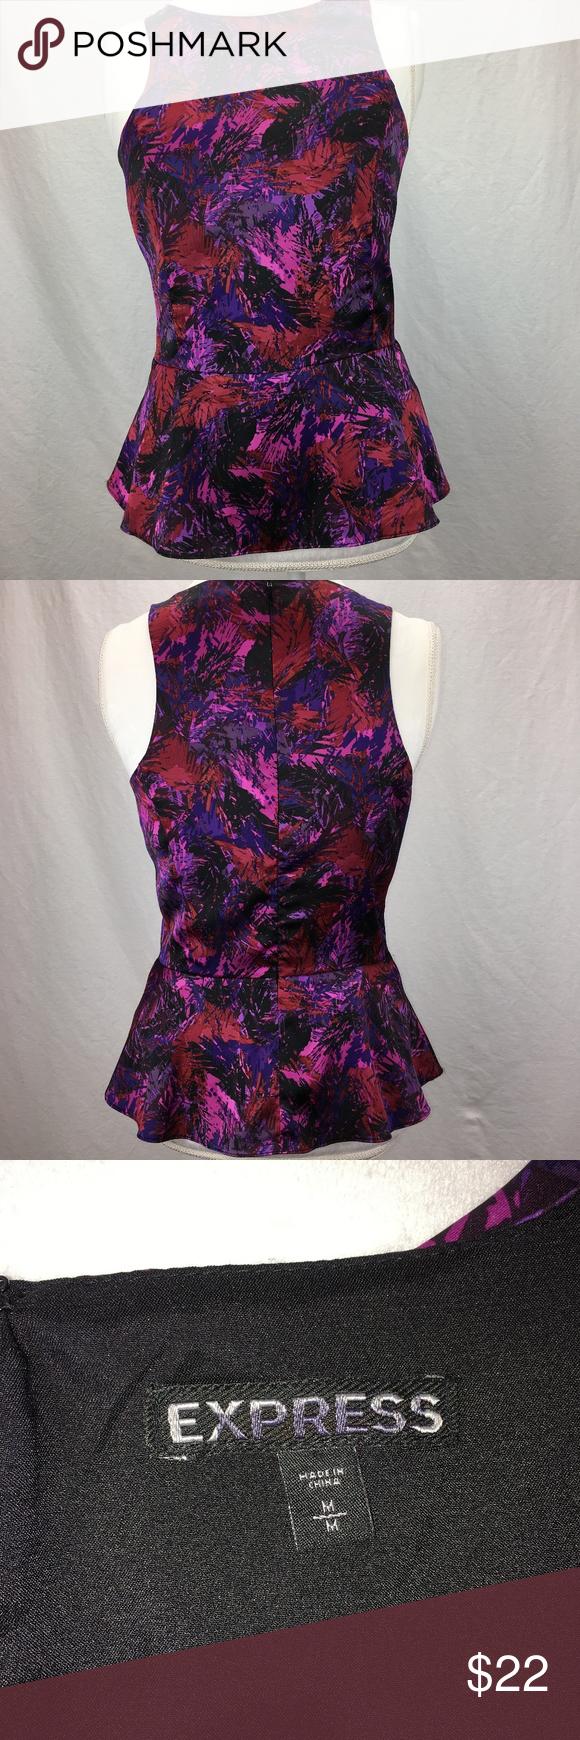 f4365066fe9c3 EXPRESS fitted sleeveless peplum blouse SZ M EXPRESS cutaway sleeveless  peplum blouse. Dainty and Elegant